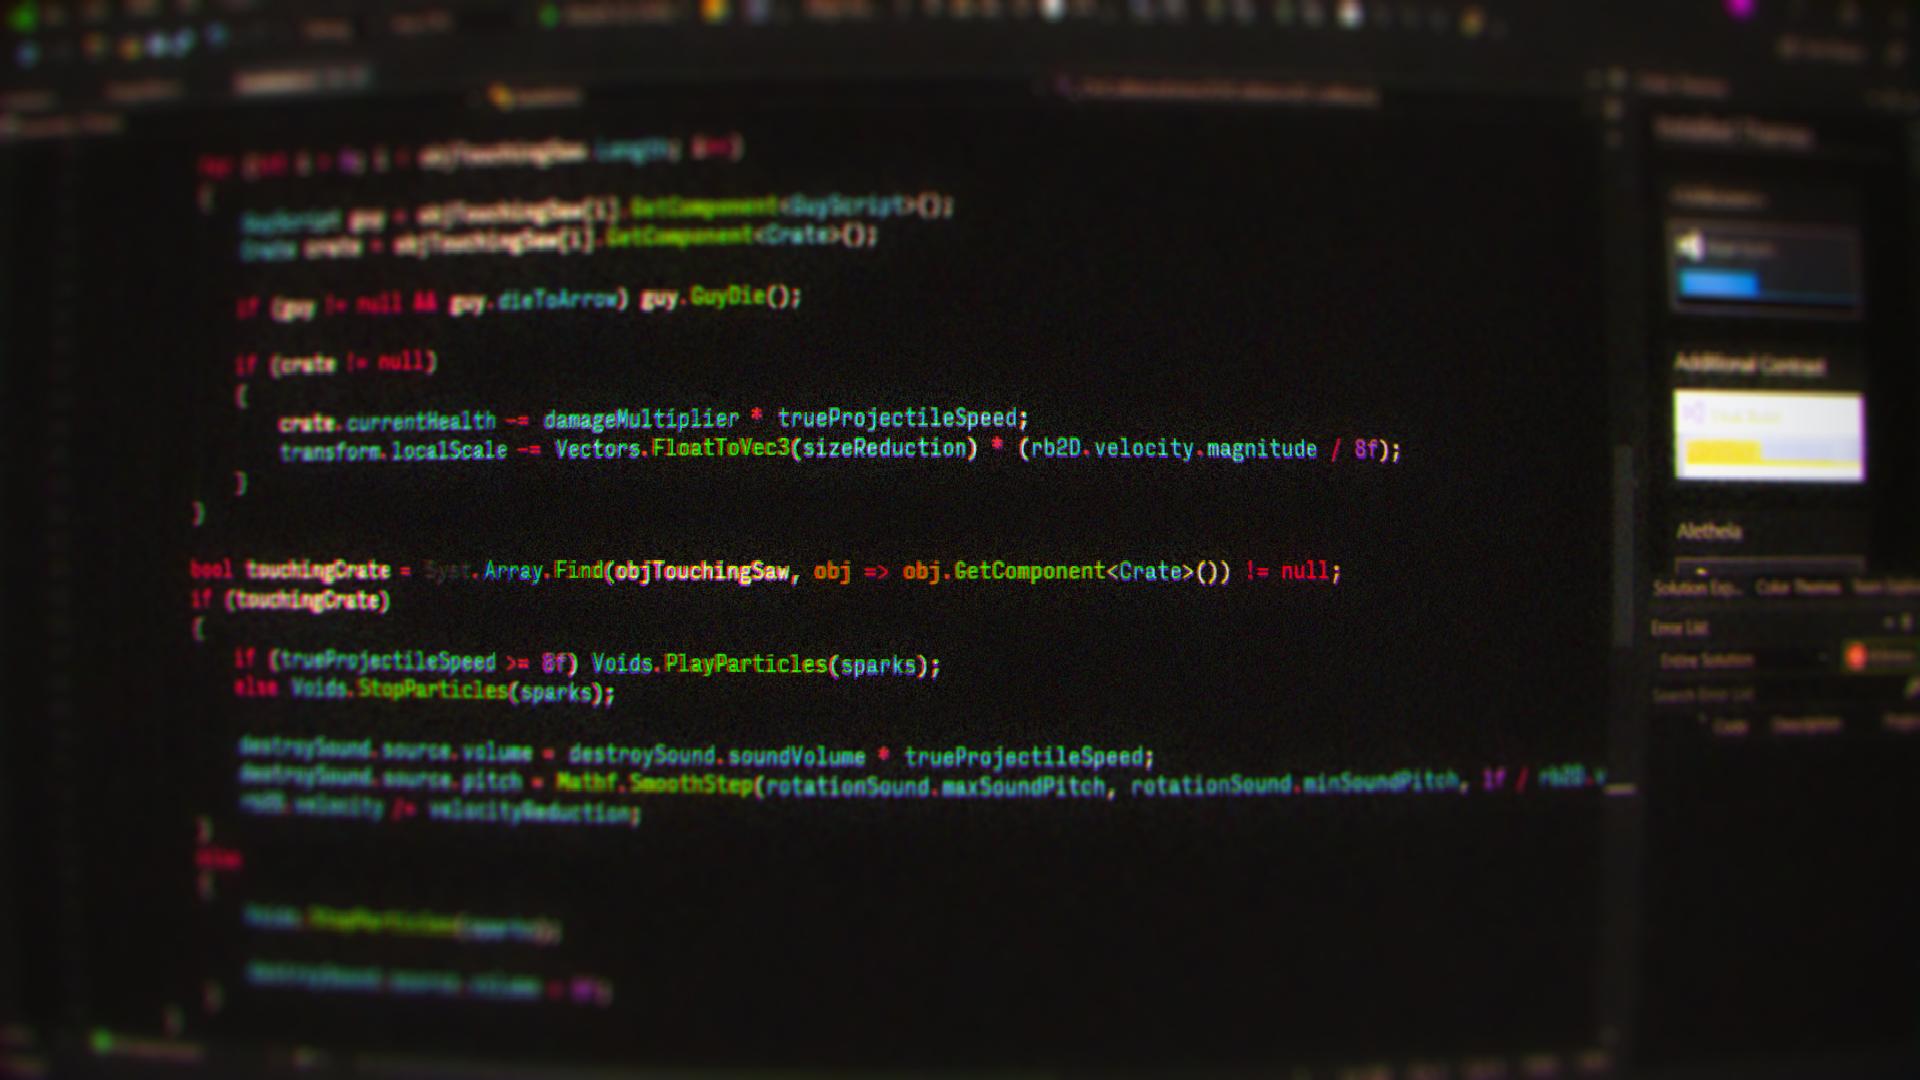 General 1920x1080 code computer technology programming programming language csharp depth of field monitor blurred tilt shift noisy grainy Microsoft Visual Studio syntax highlighting